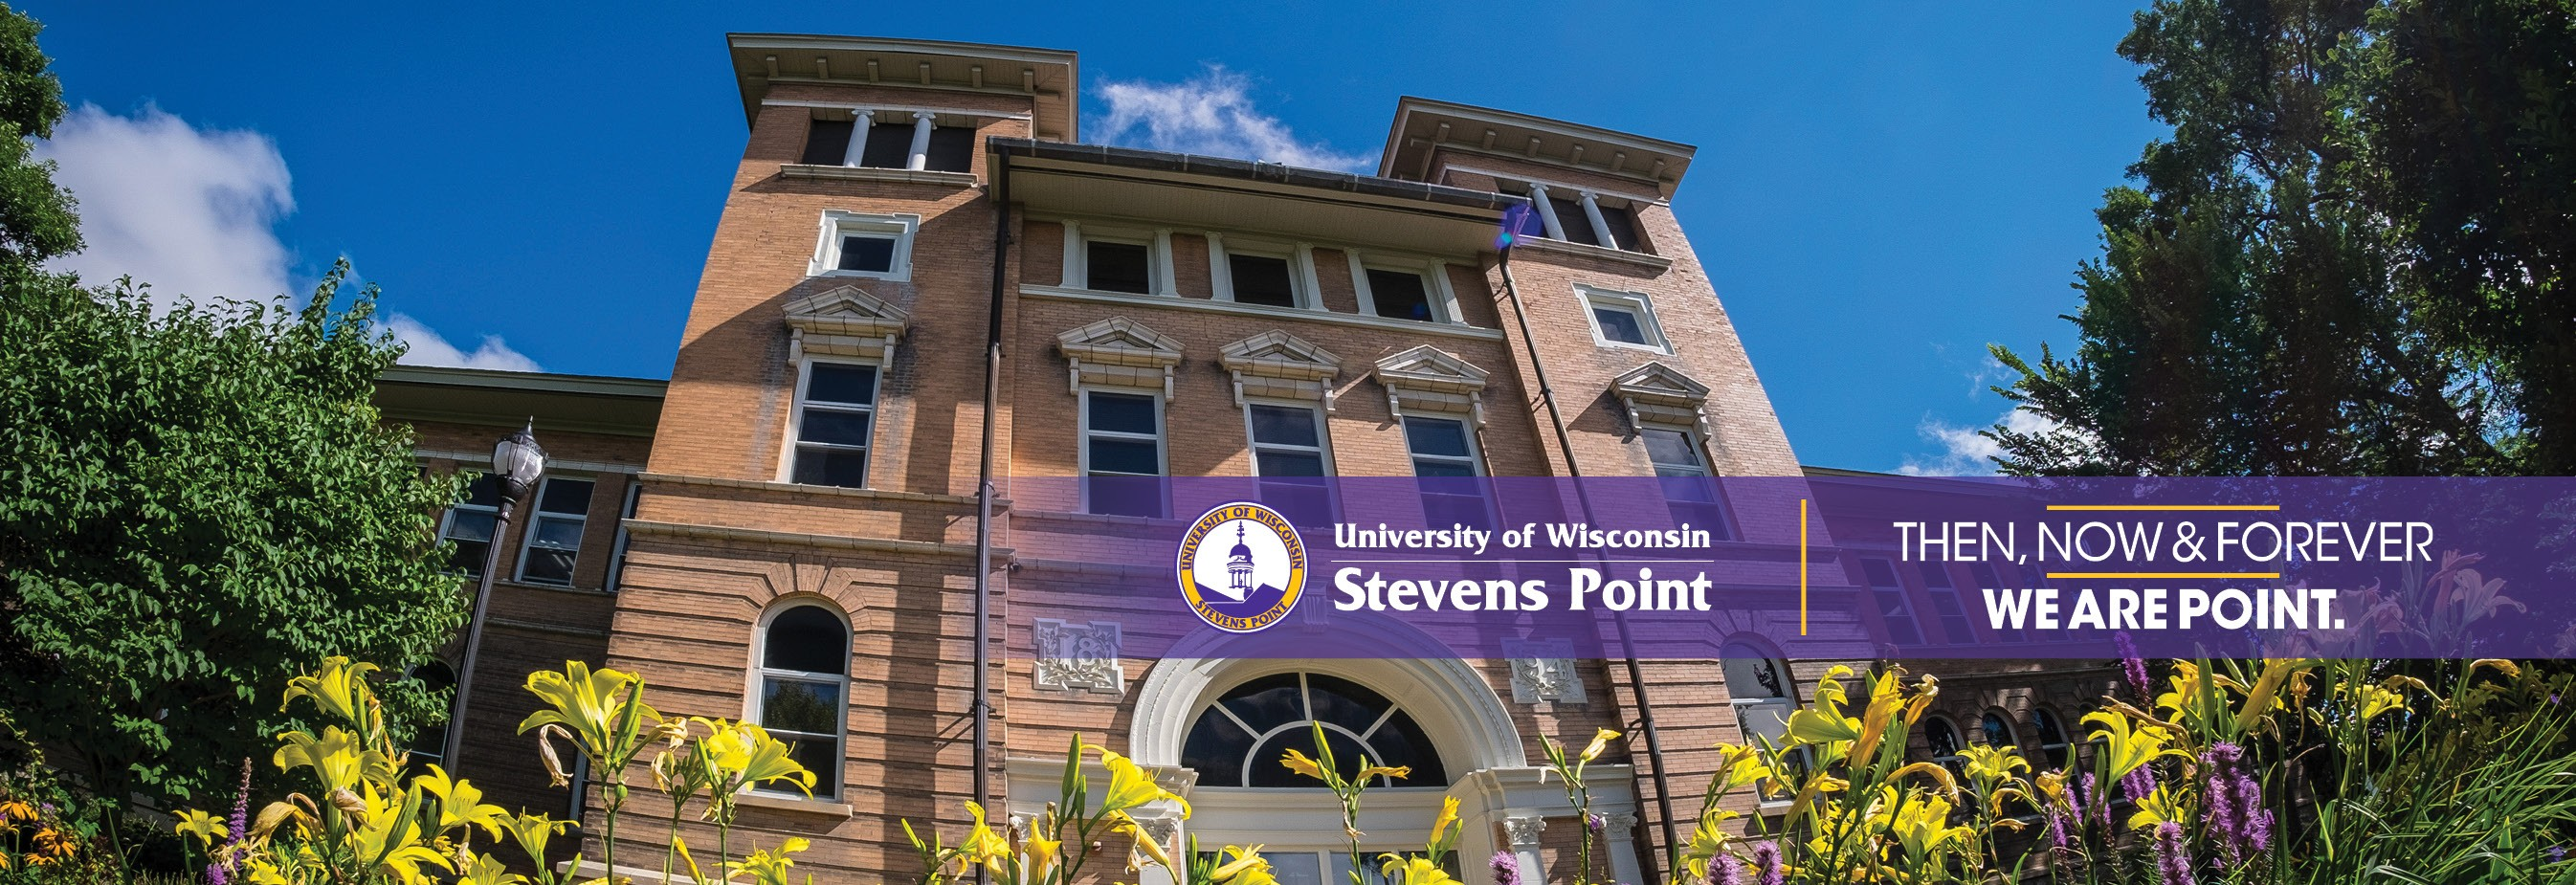 University of Wisconsin-Stevens Point | LinkedIn